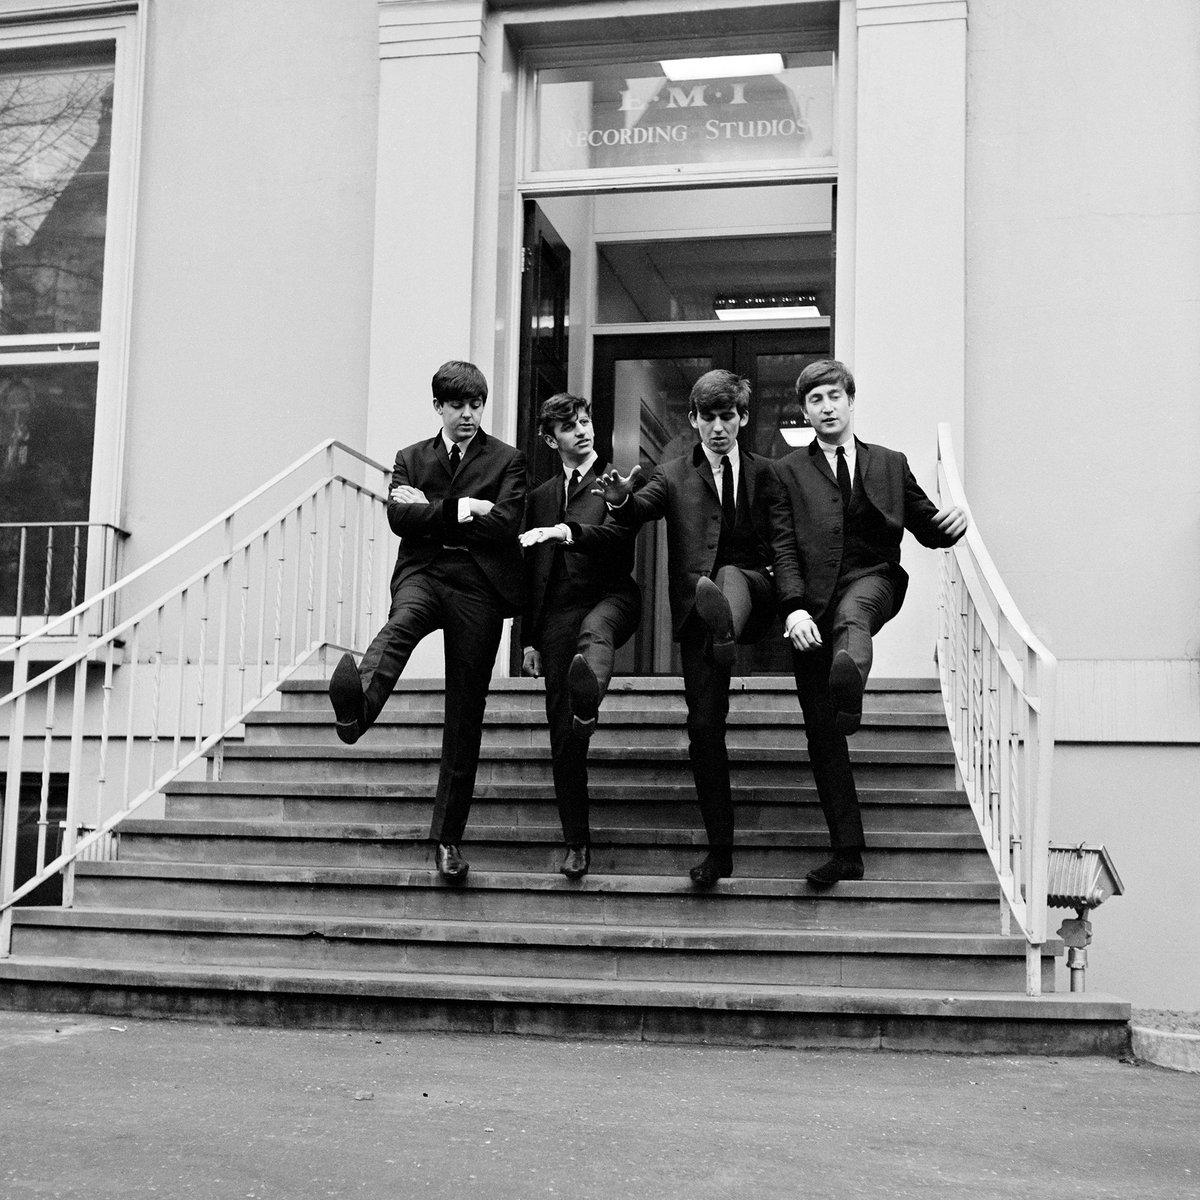 DfBEKHRX0AELG1H - Abbey Road - Beatles Reminiscences